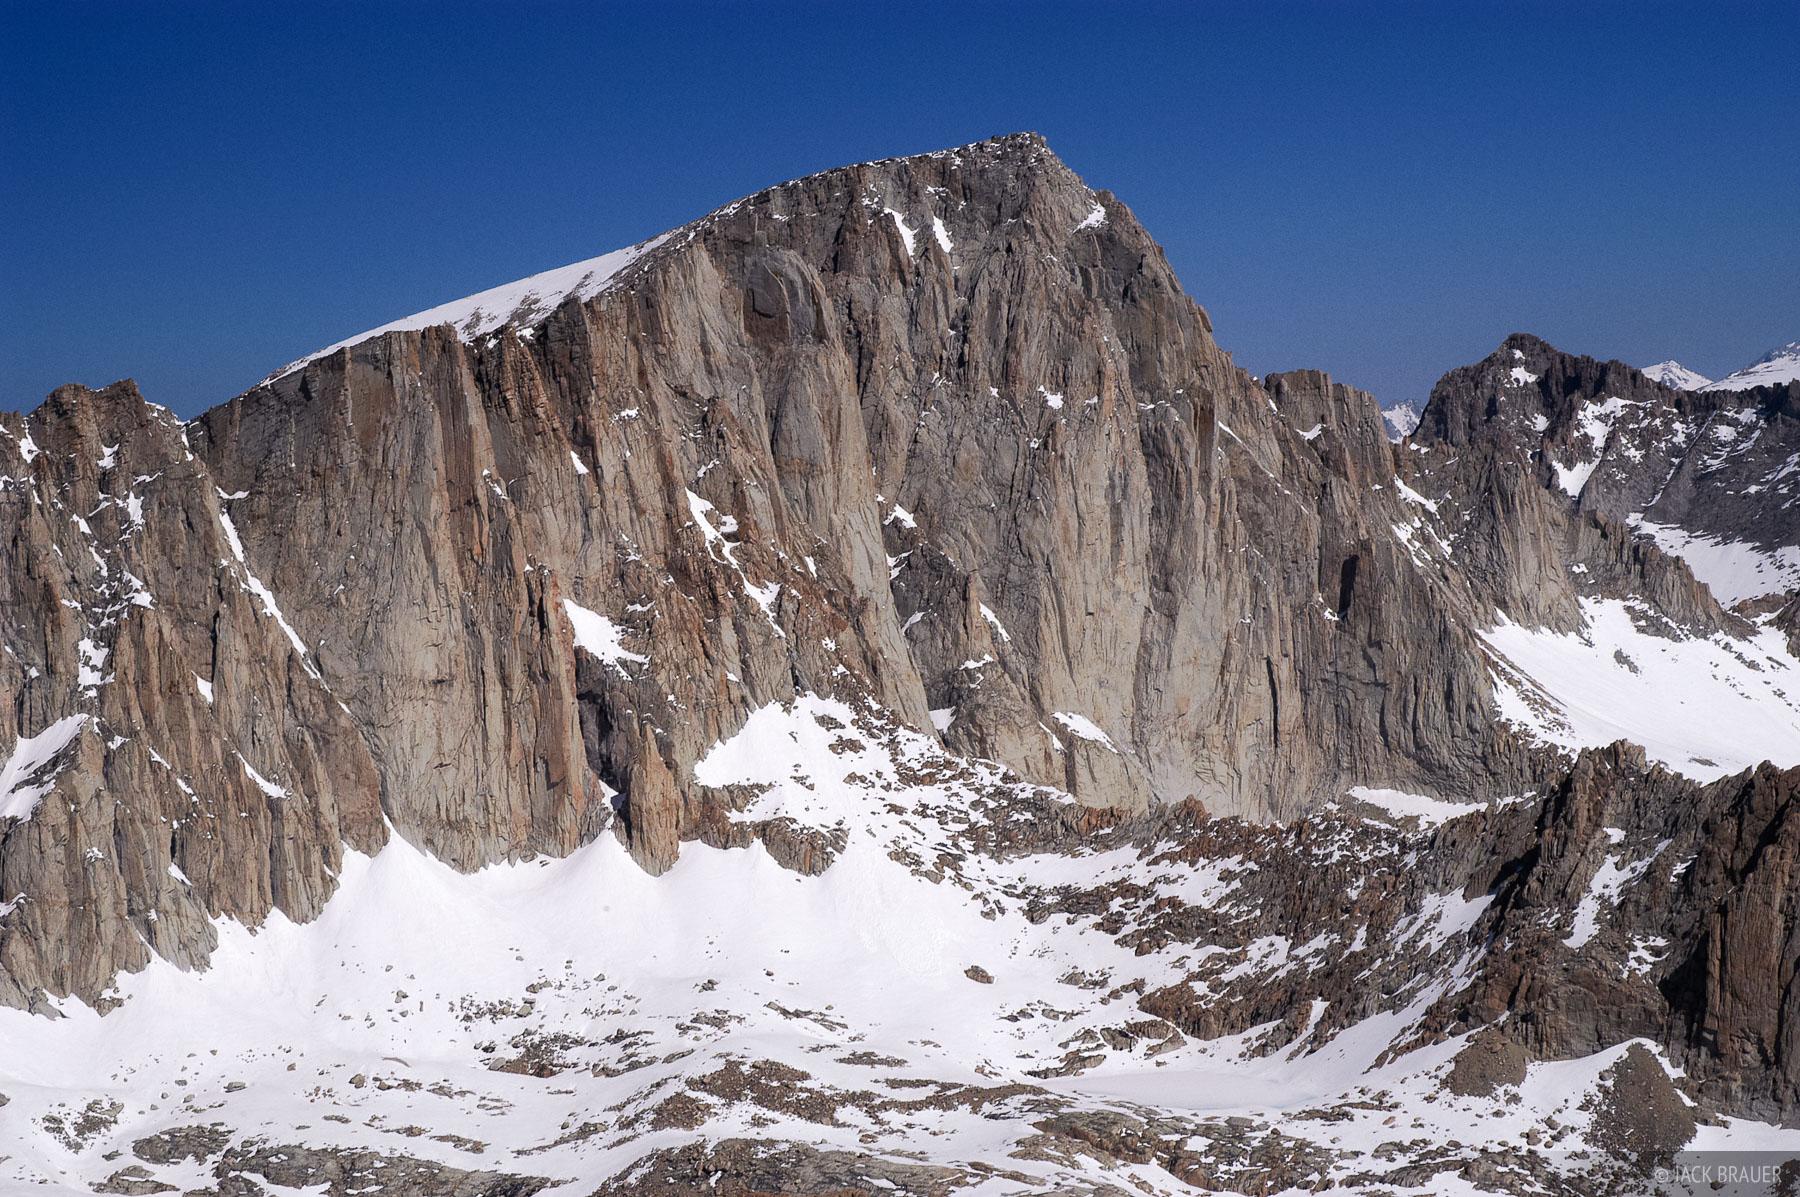 Mt. Whitney, Mt. Irvine, Sierra Nevada, California, photo